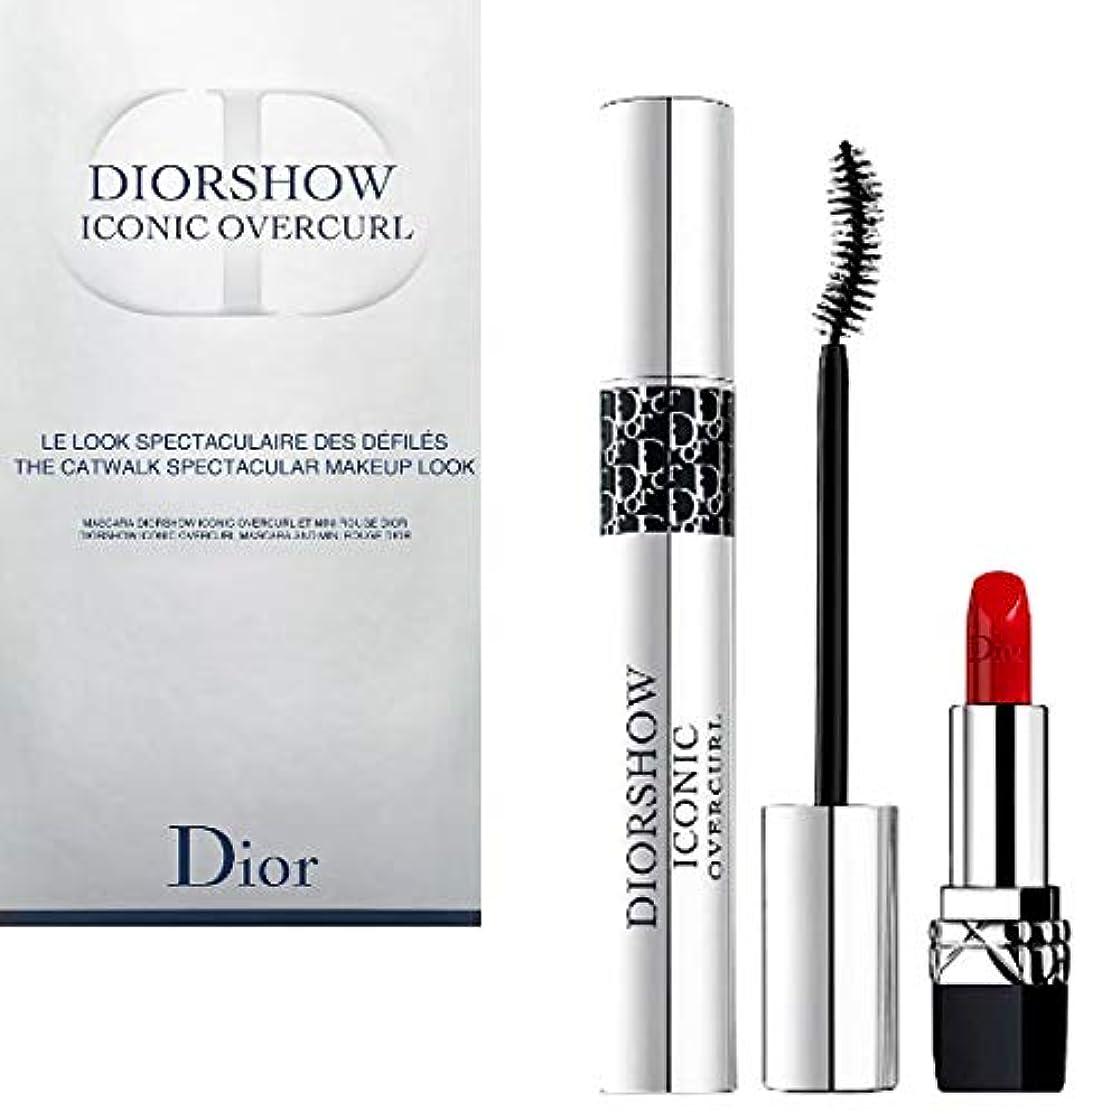 編集者関係義務的Dior, Diorshow Iconic Overcurl Catwalk Spectacular Makeup Look Set [海外直送品] [並行輸入品]